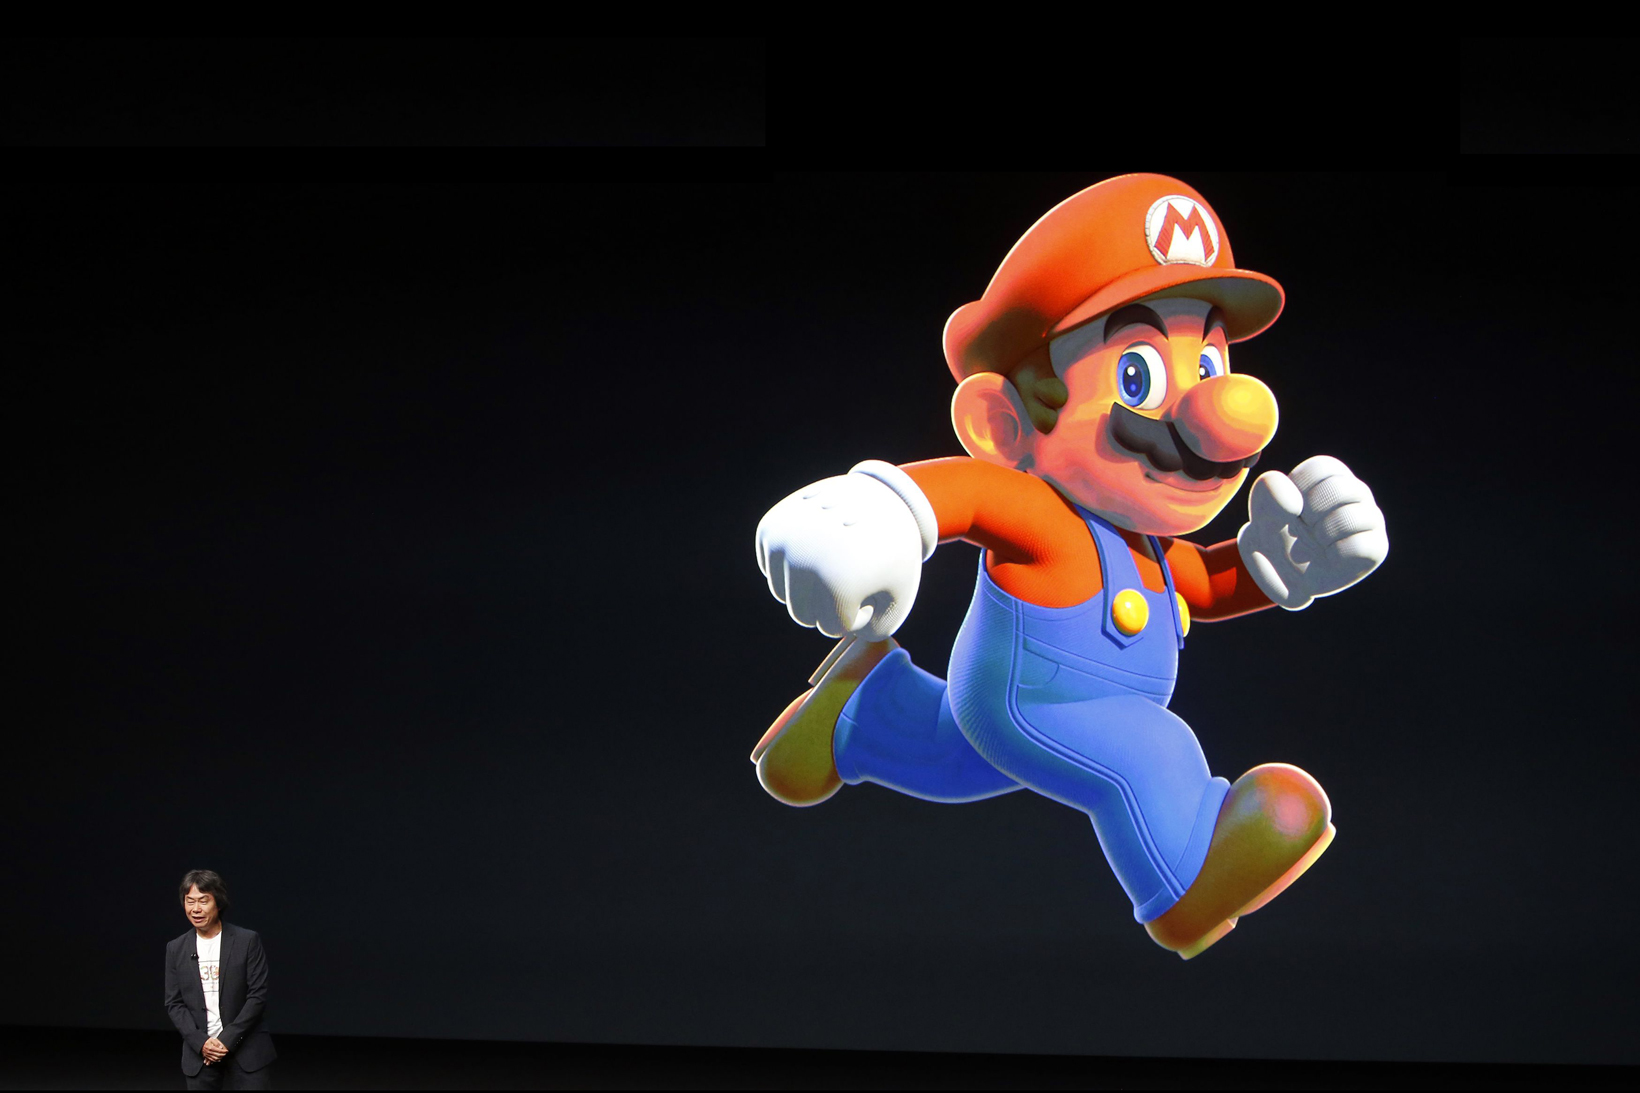 Shigeru Miyamoto Super Mario Run Apple Event - 1308199